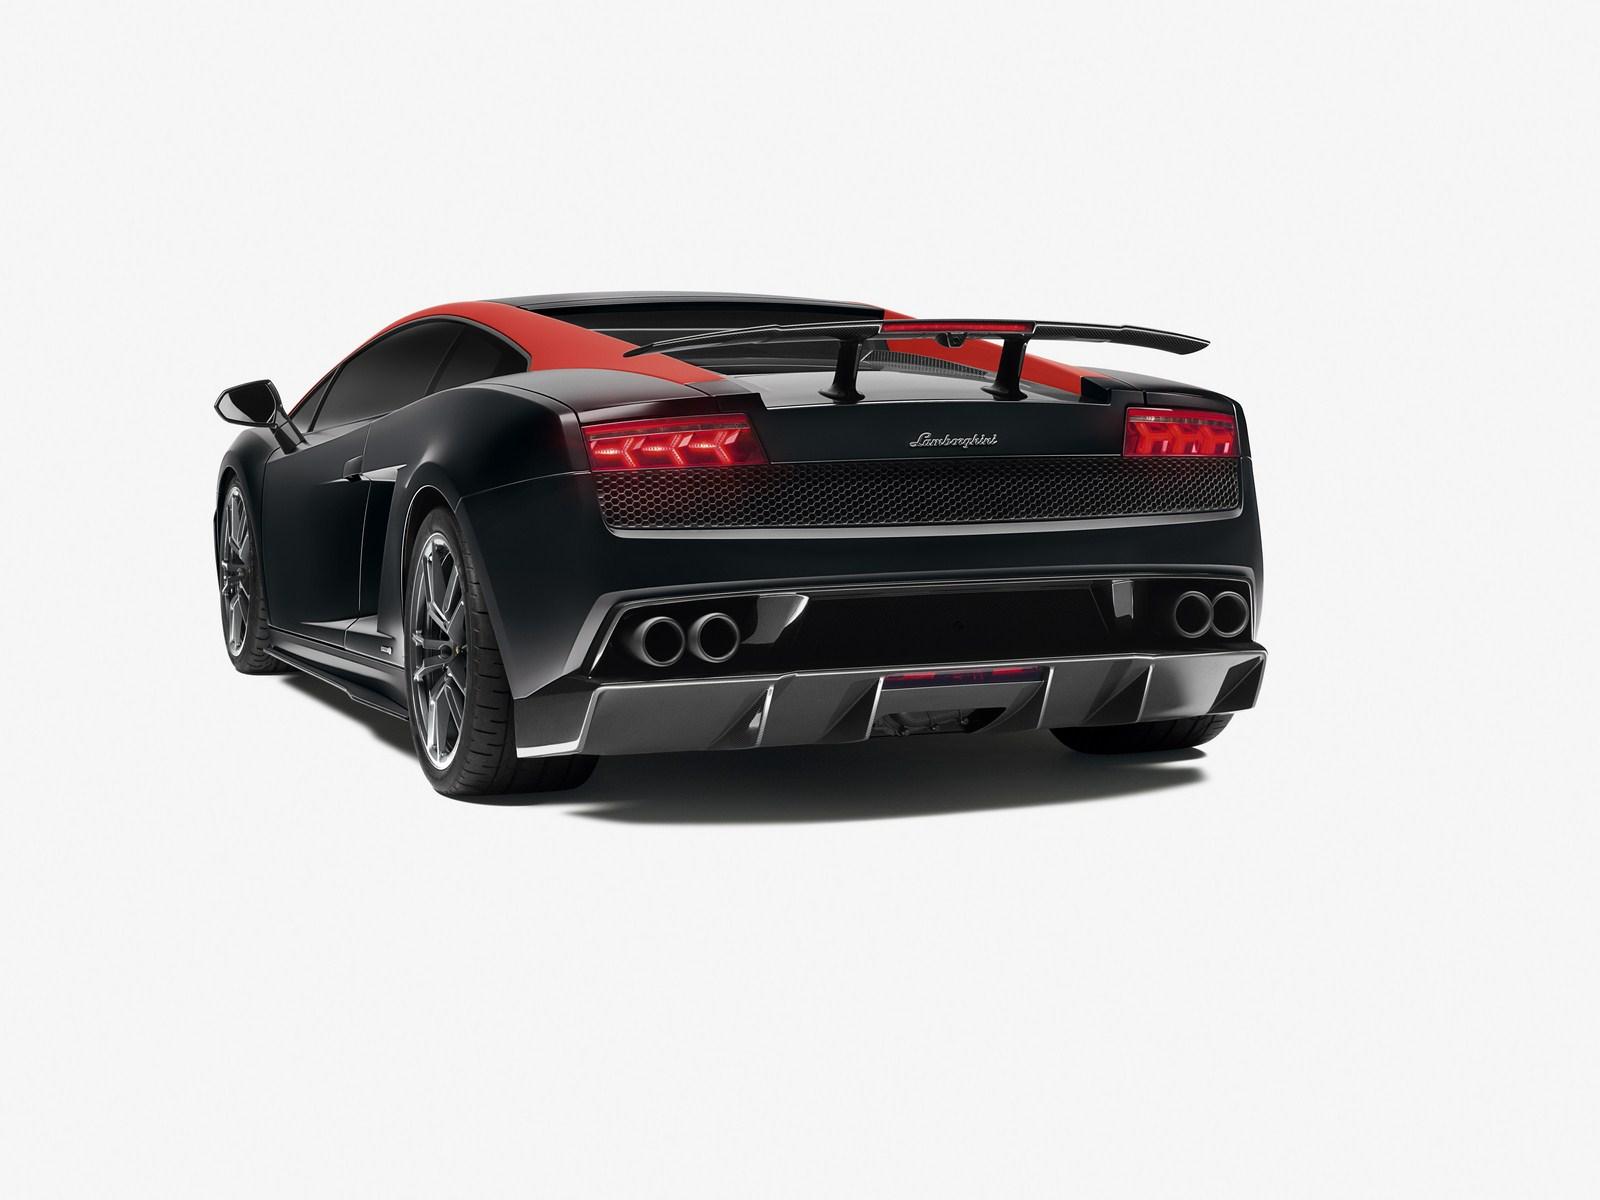 [Resim: Lamborghini+Gallardo+LP+570-4+Edizione+Tecnica+2.jpg]